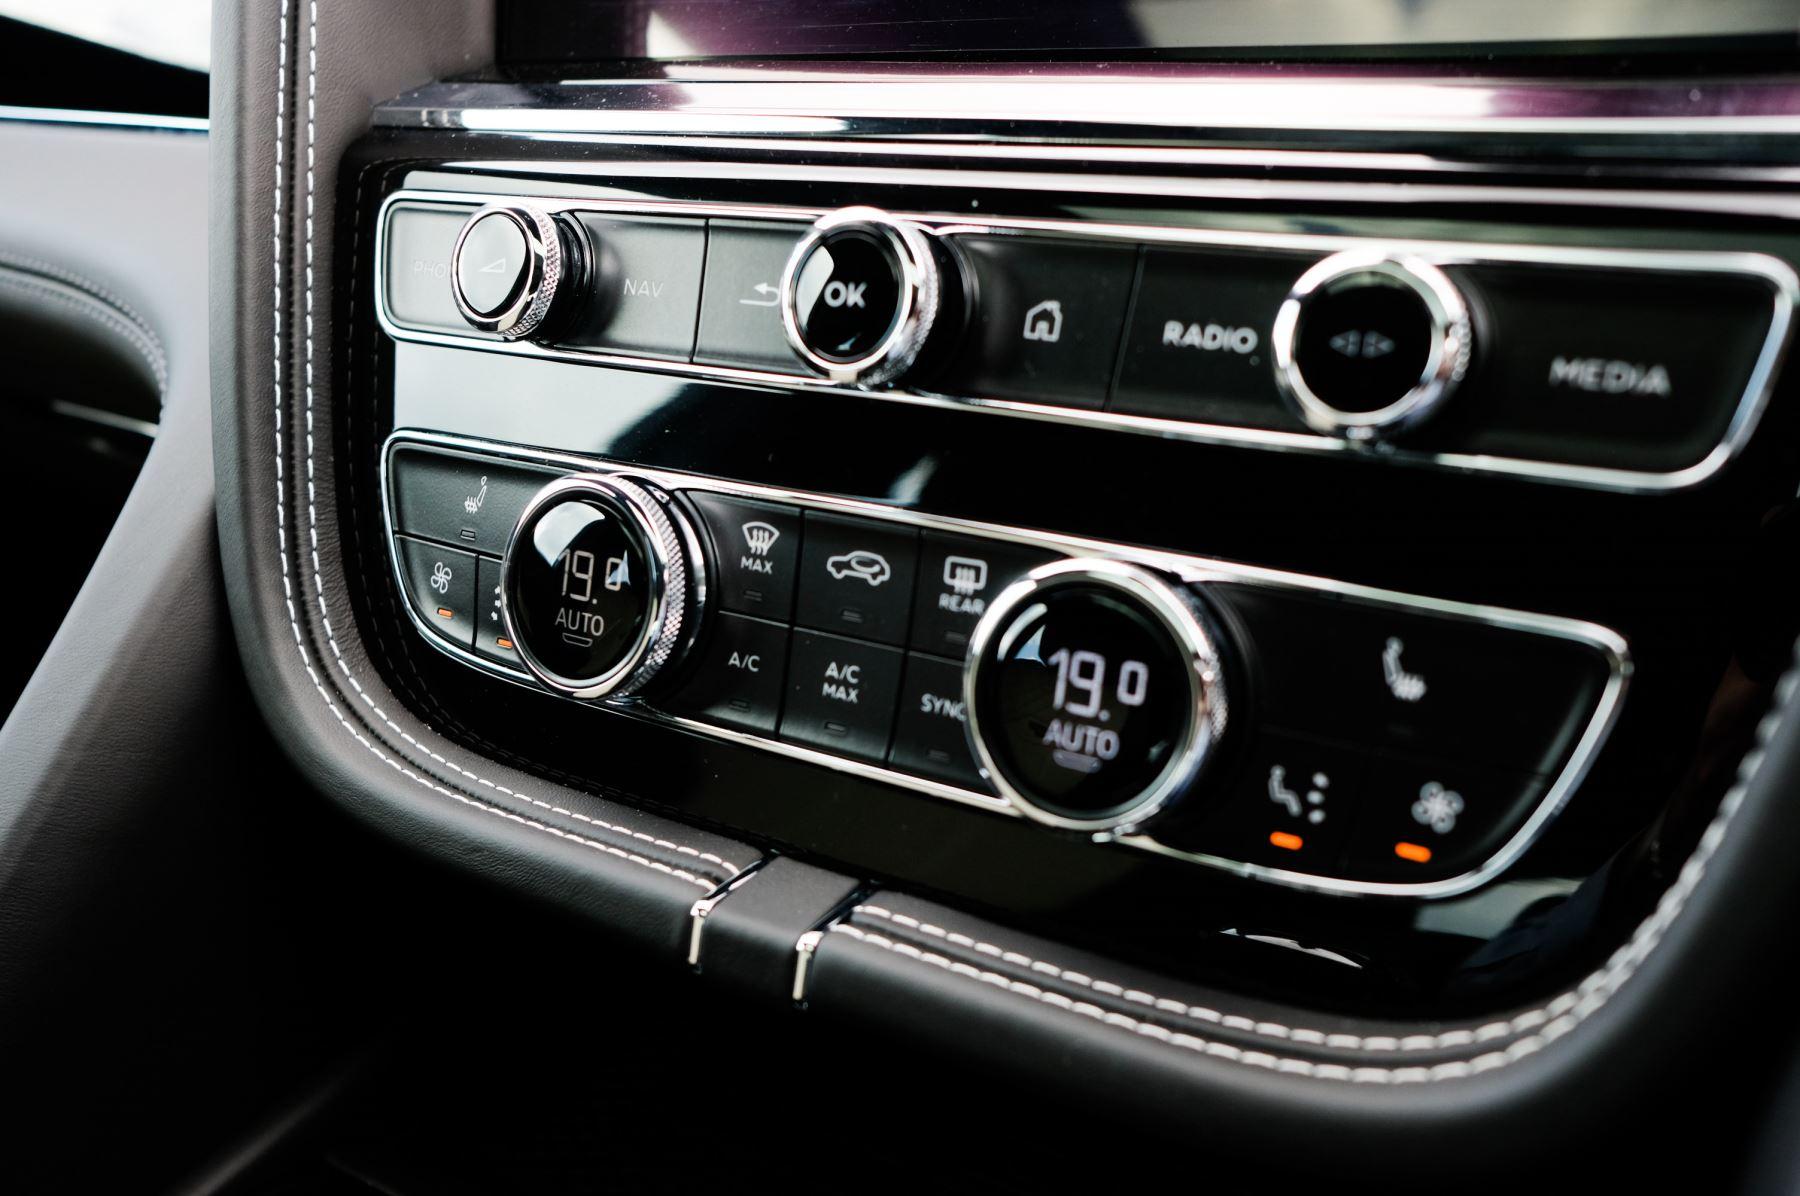 Bentley Bentayga 4.0 V8 - Mulliner Driving Specification for Black Specification image 20